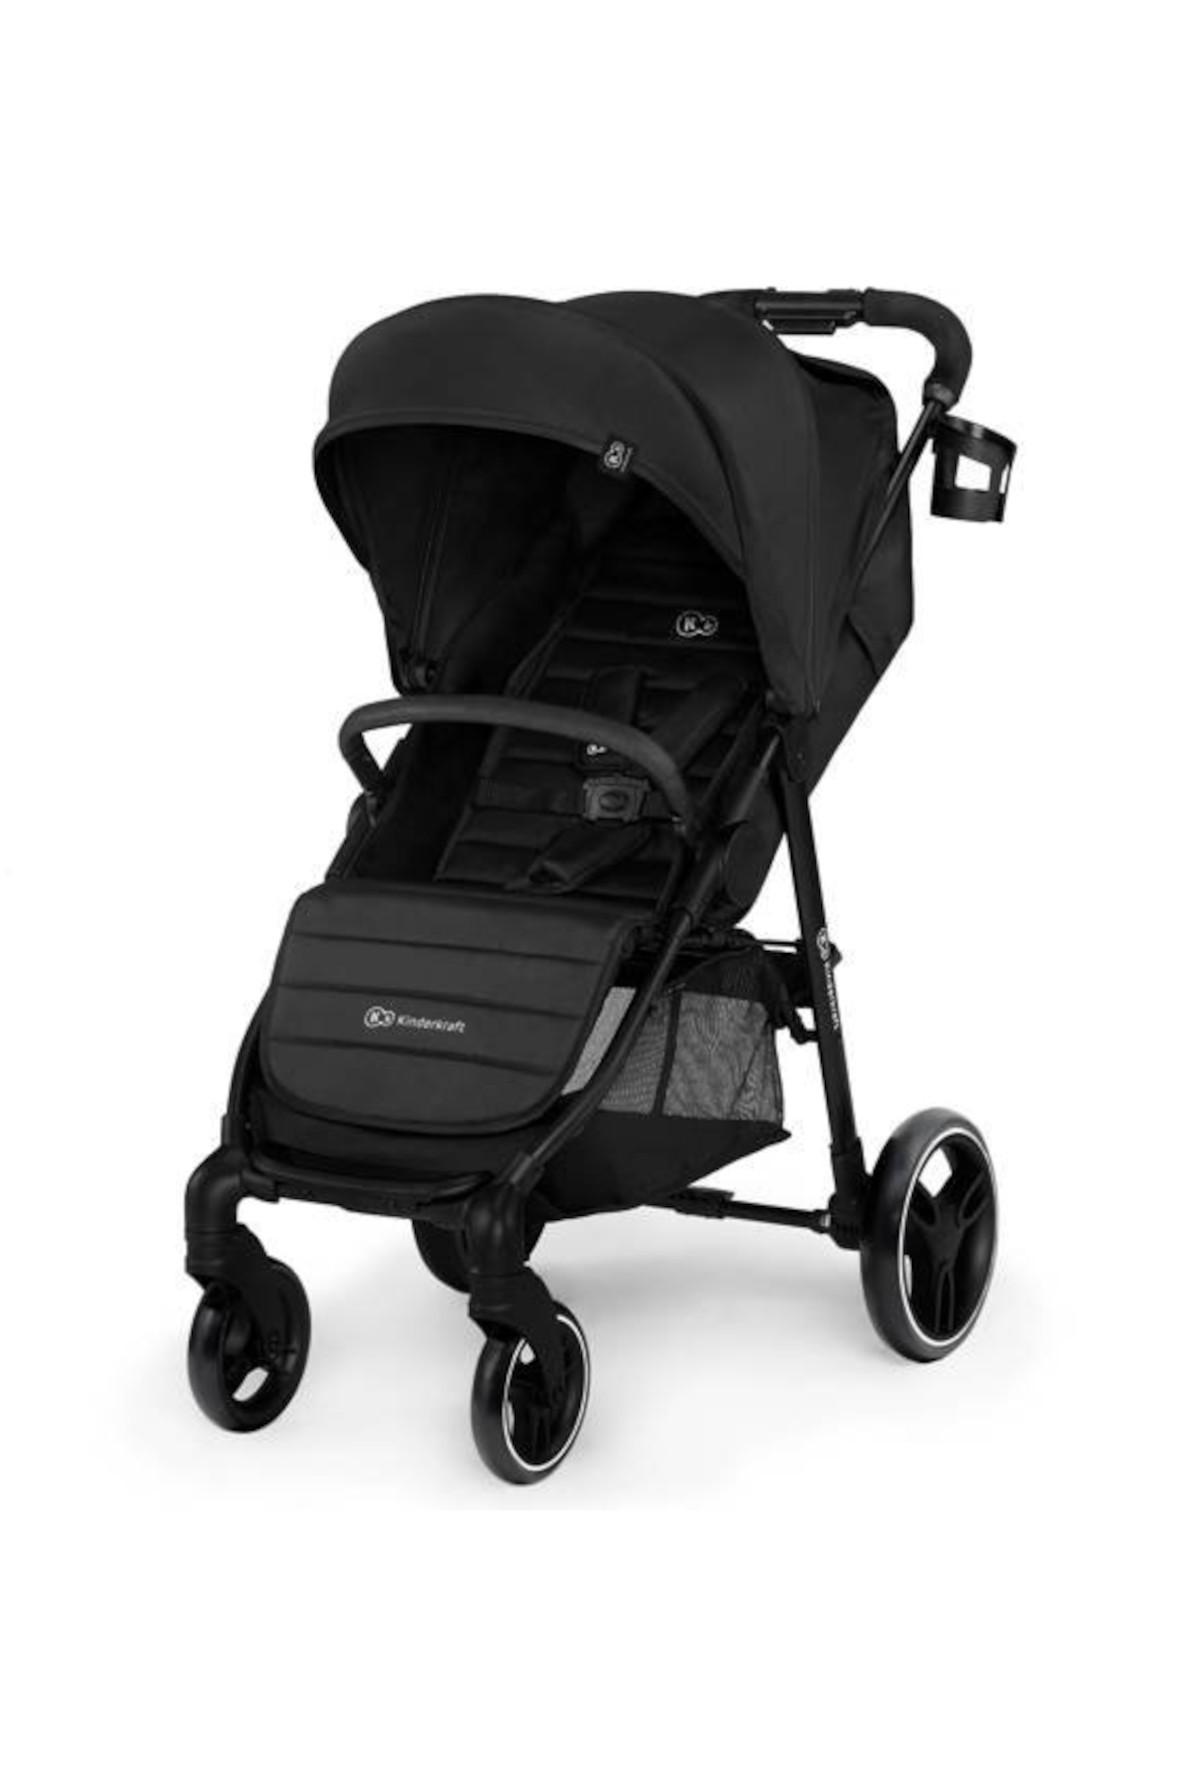 Kinderkraft wózek spacerowy Grande City czarny